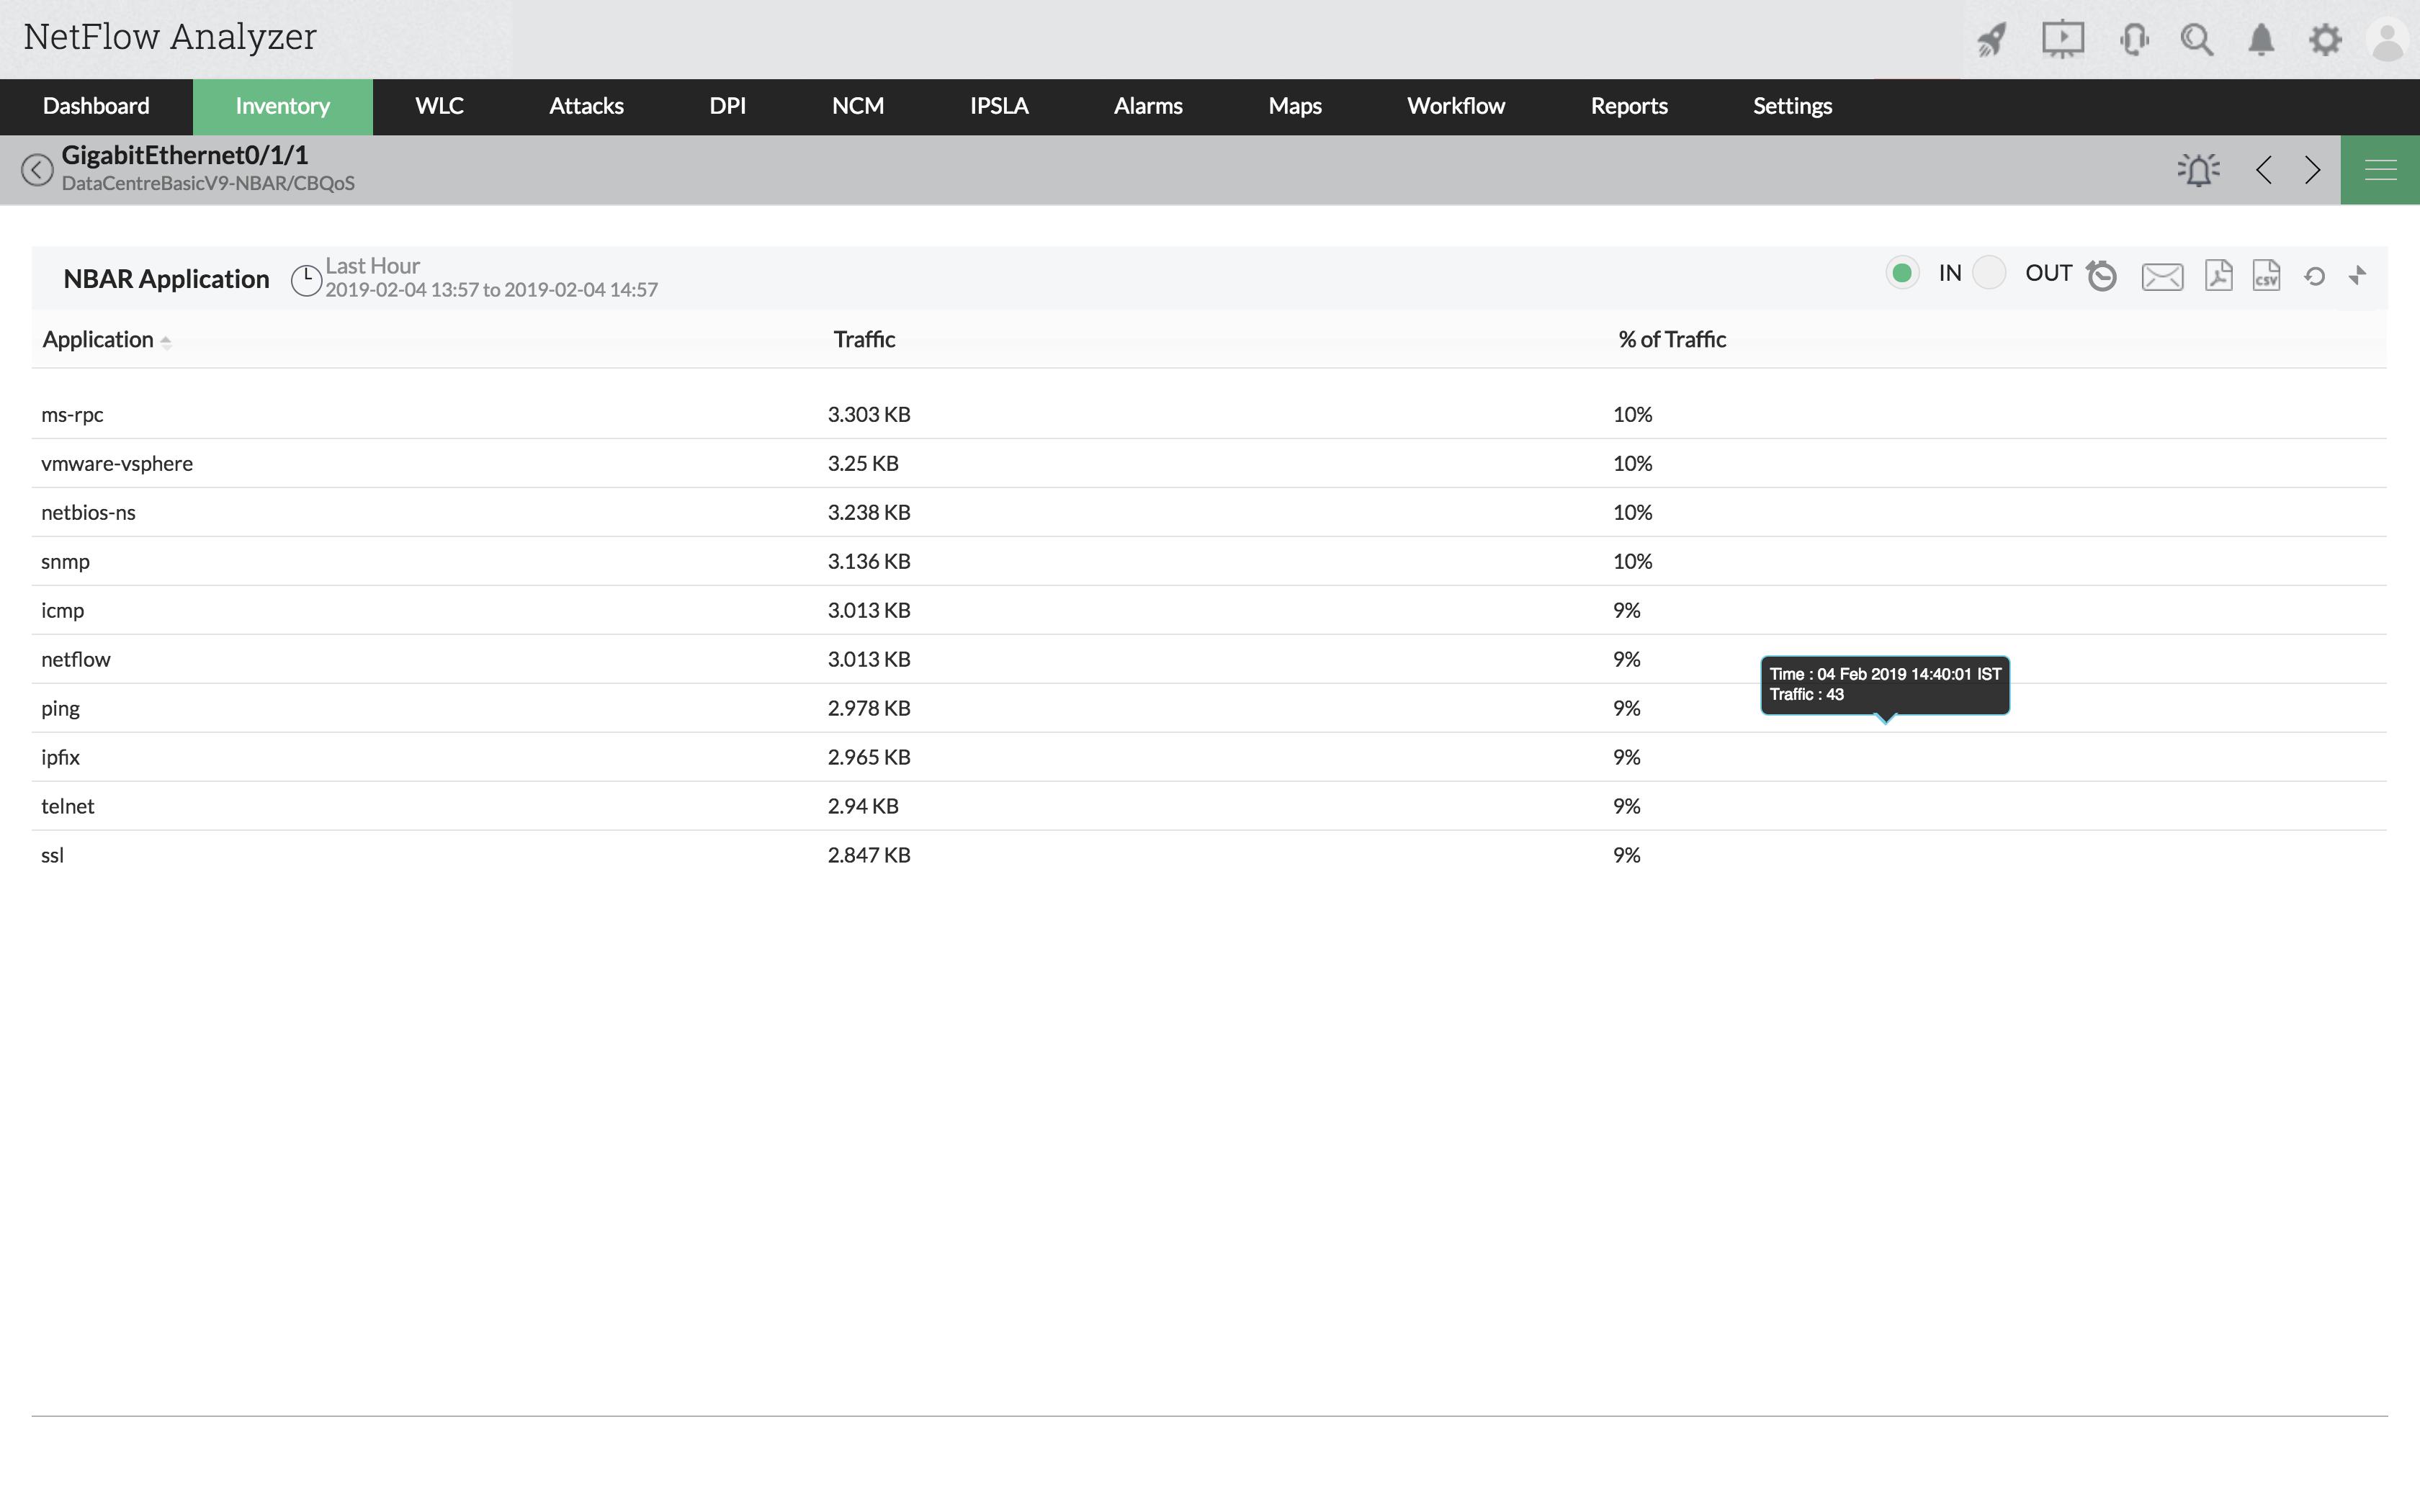 NBAR Monitoring - ManageEngine NetFlow Analyzer